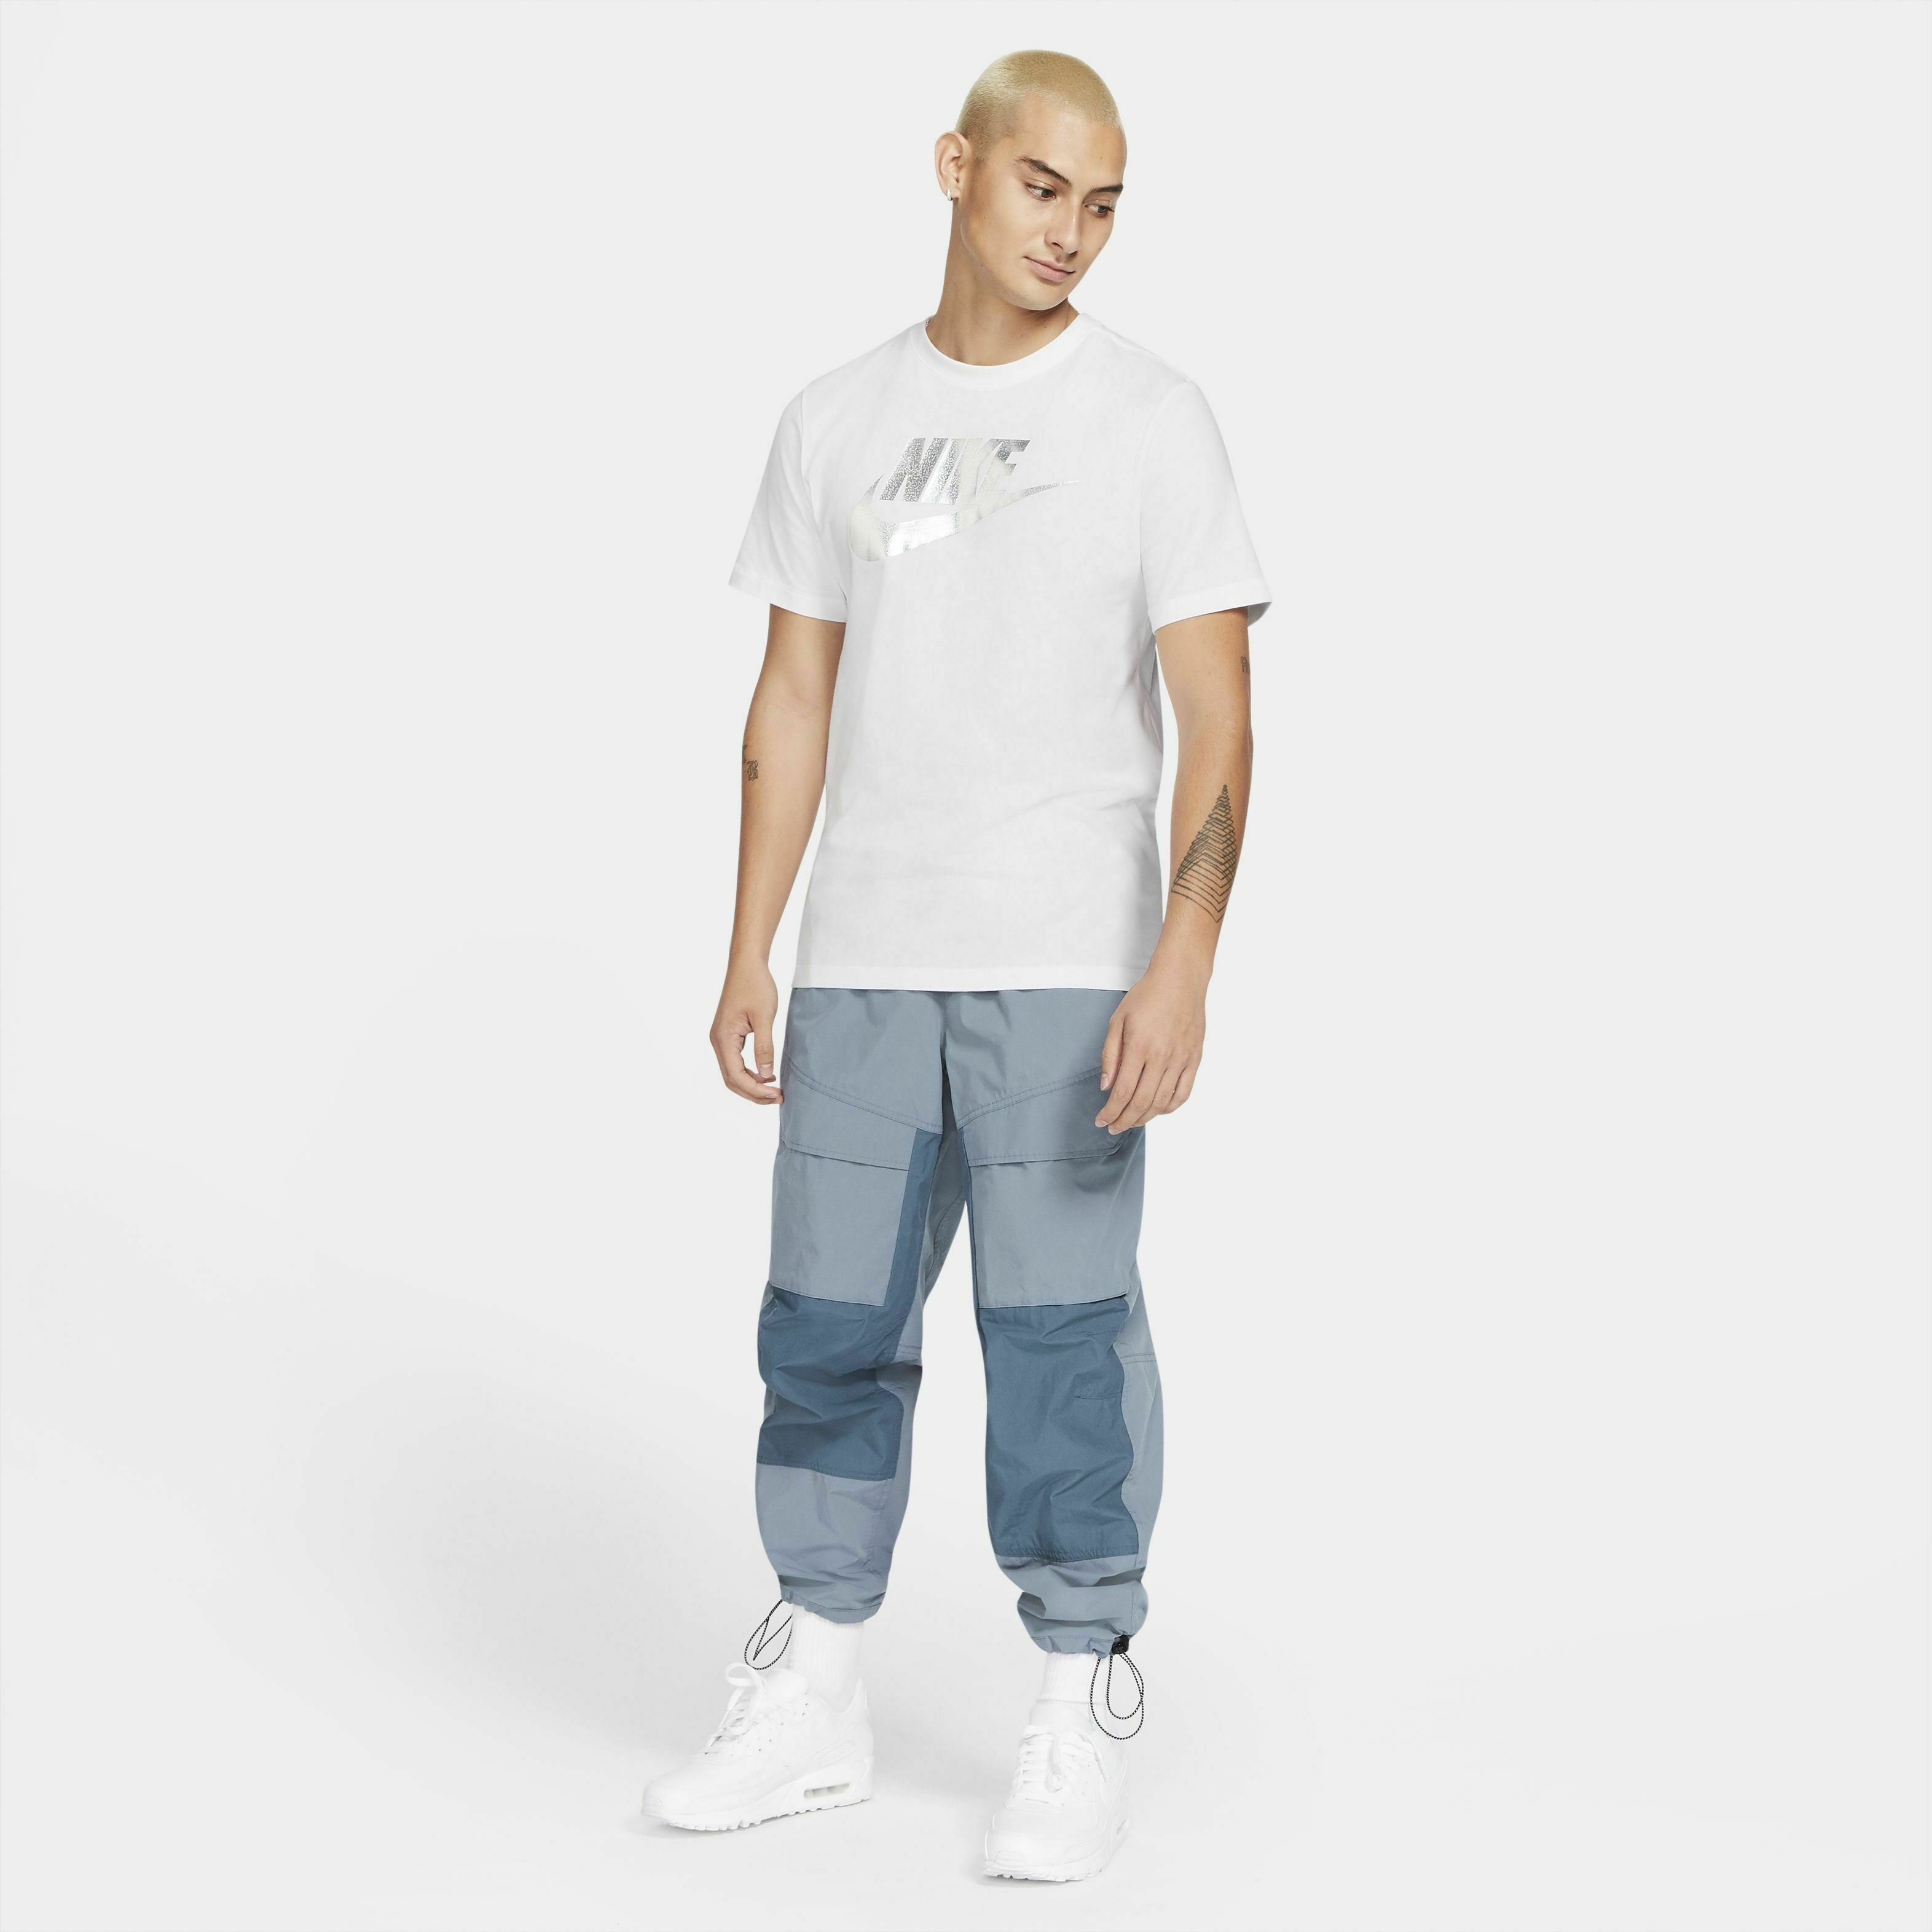 Nike Sportswear Tee Brand Mark Aplication 1 White S